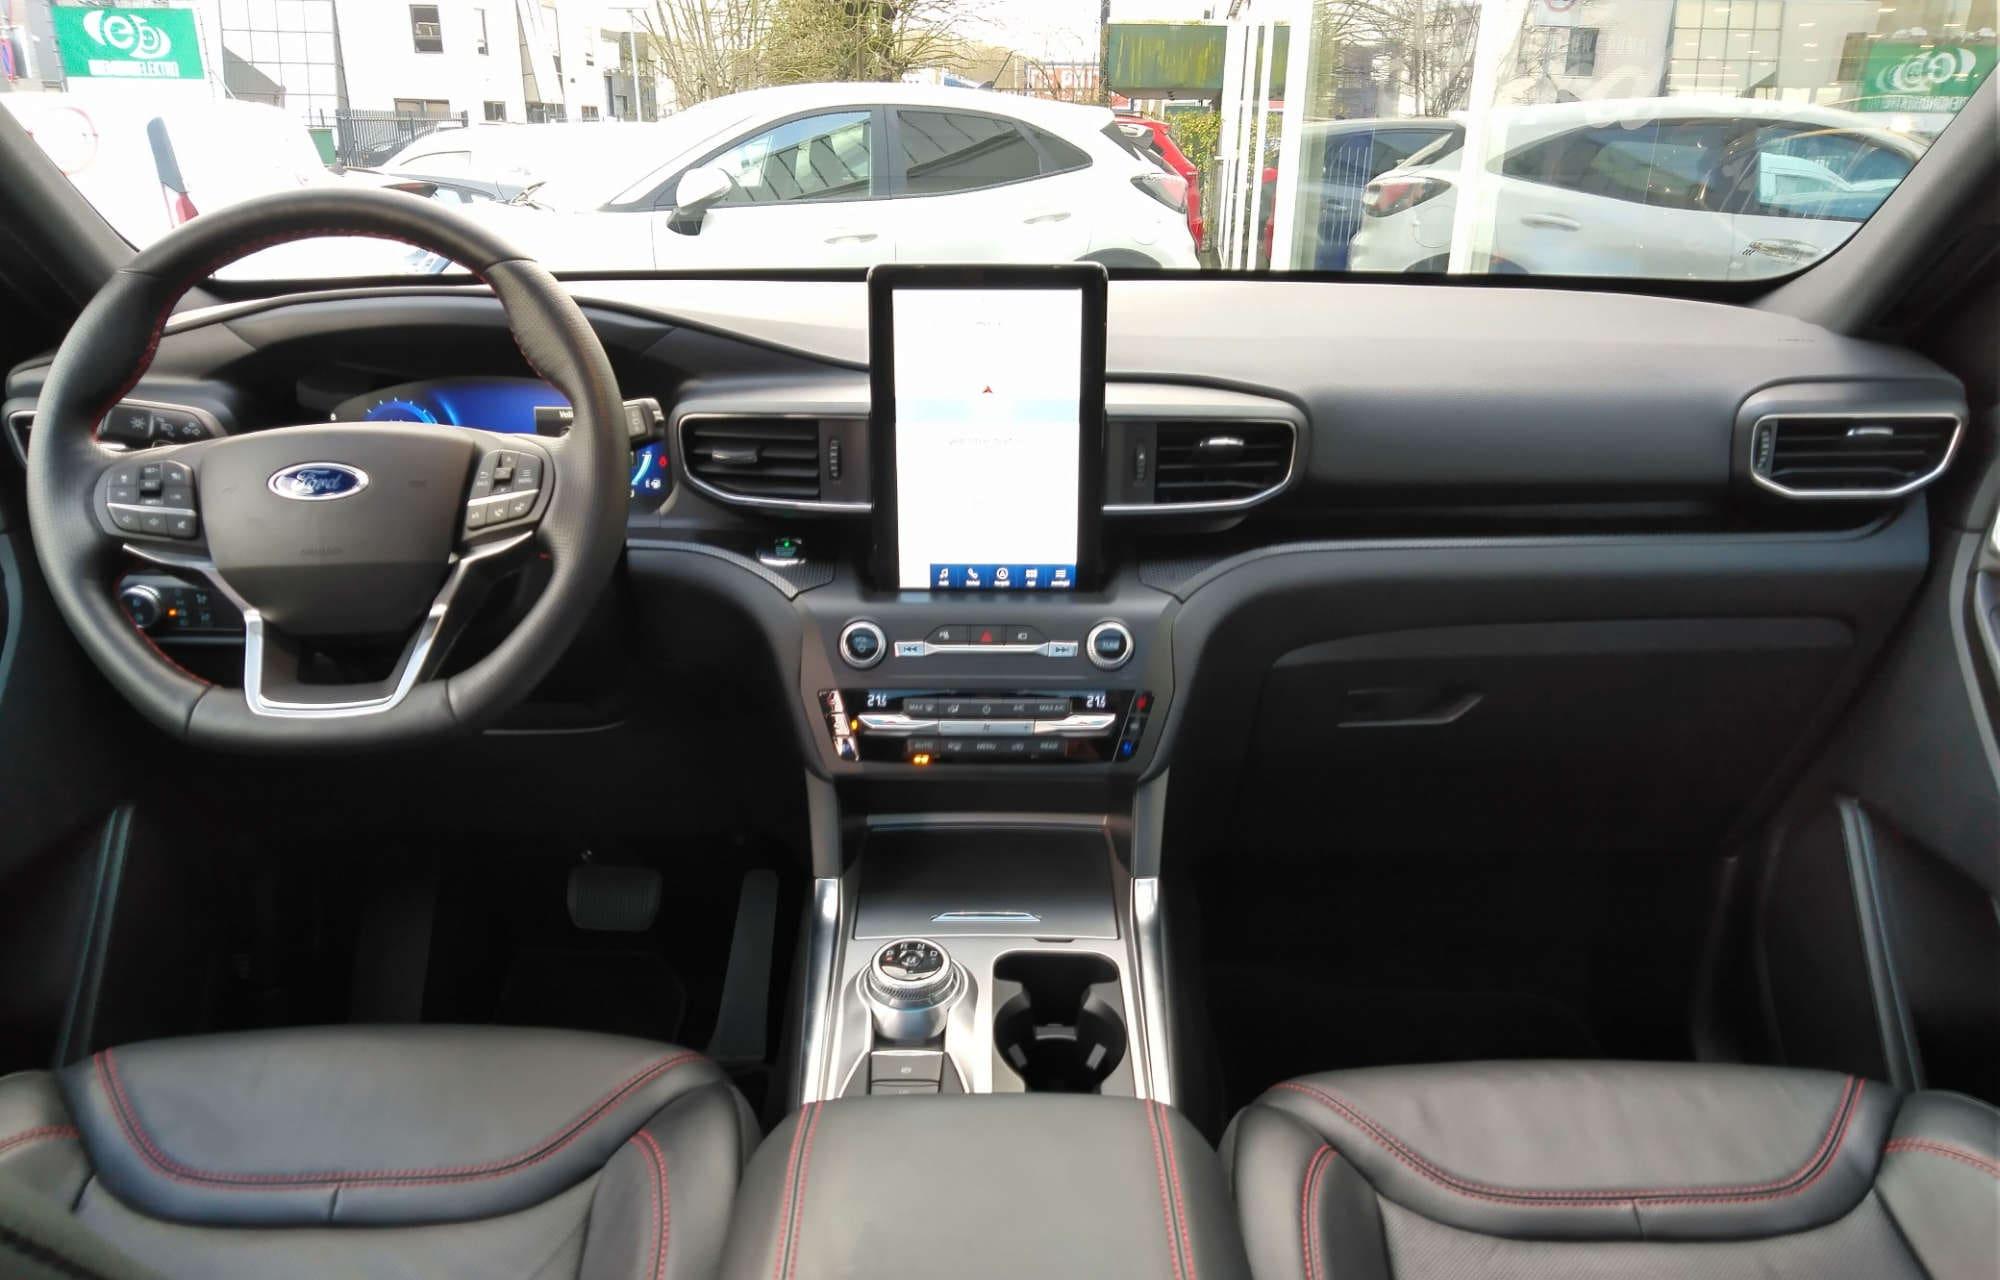 Ford Explorer Plug-in Hybrid